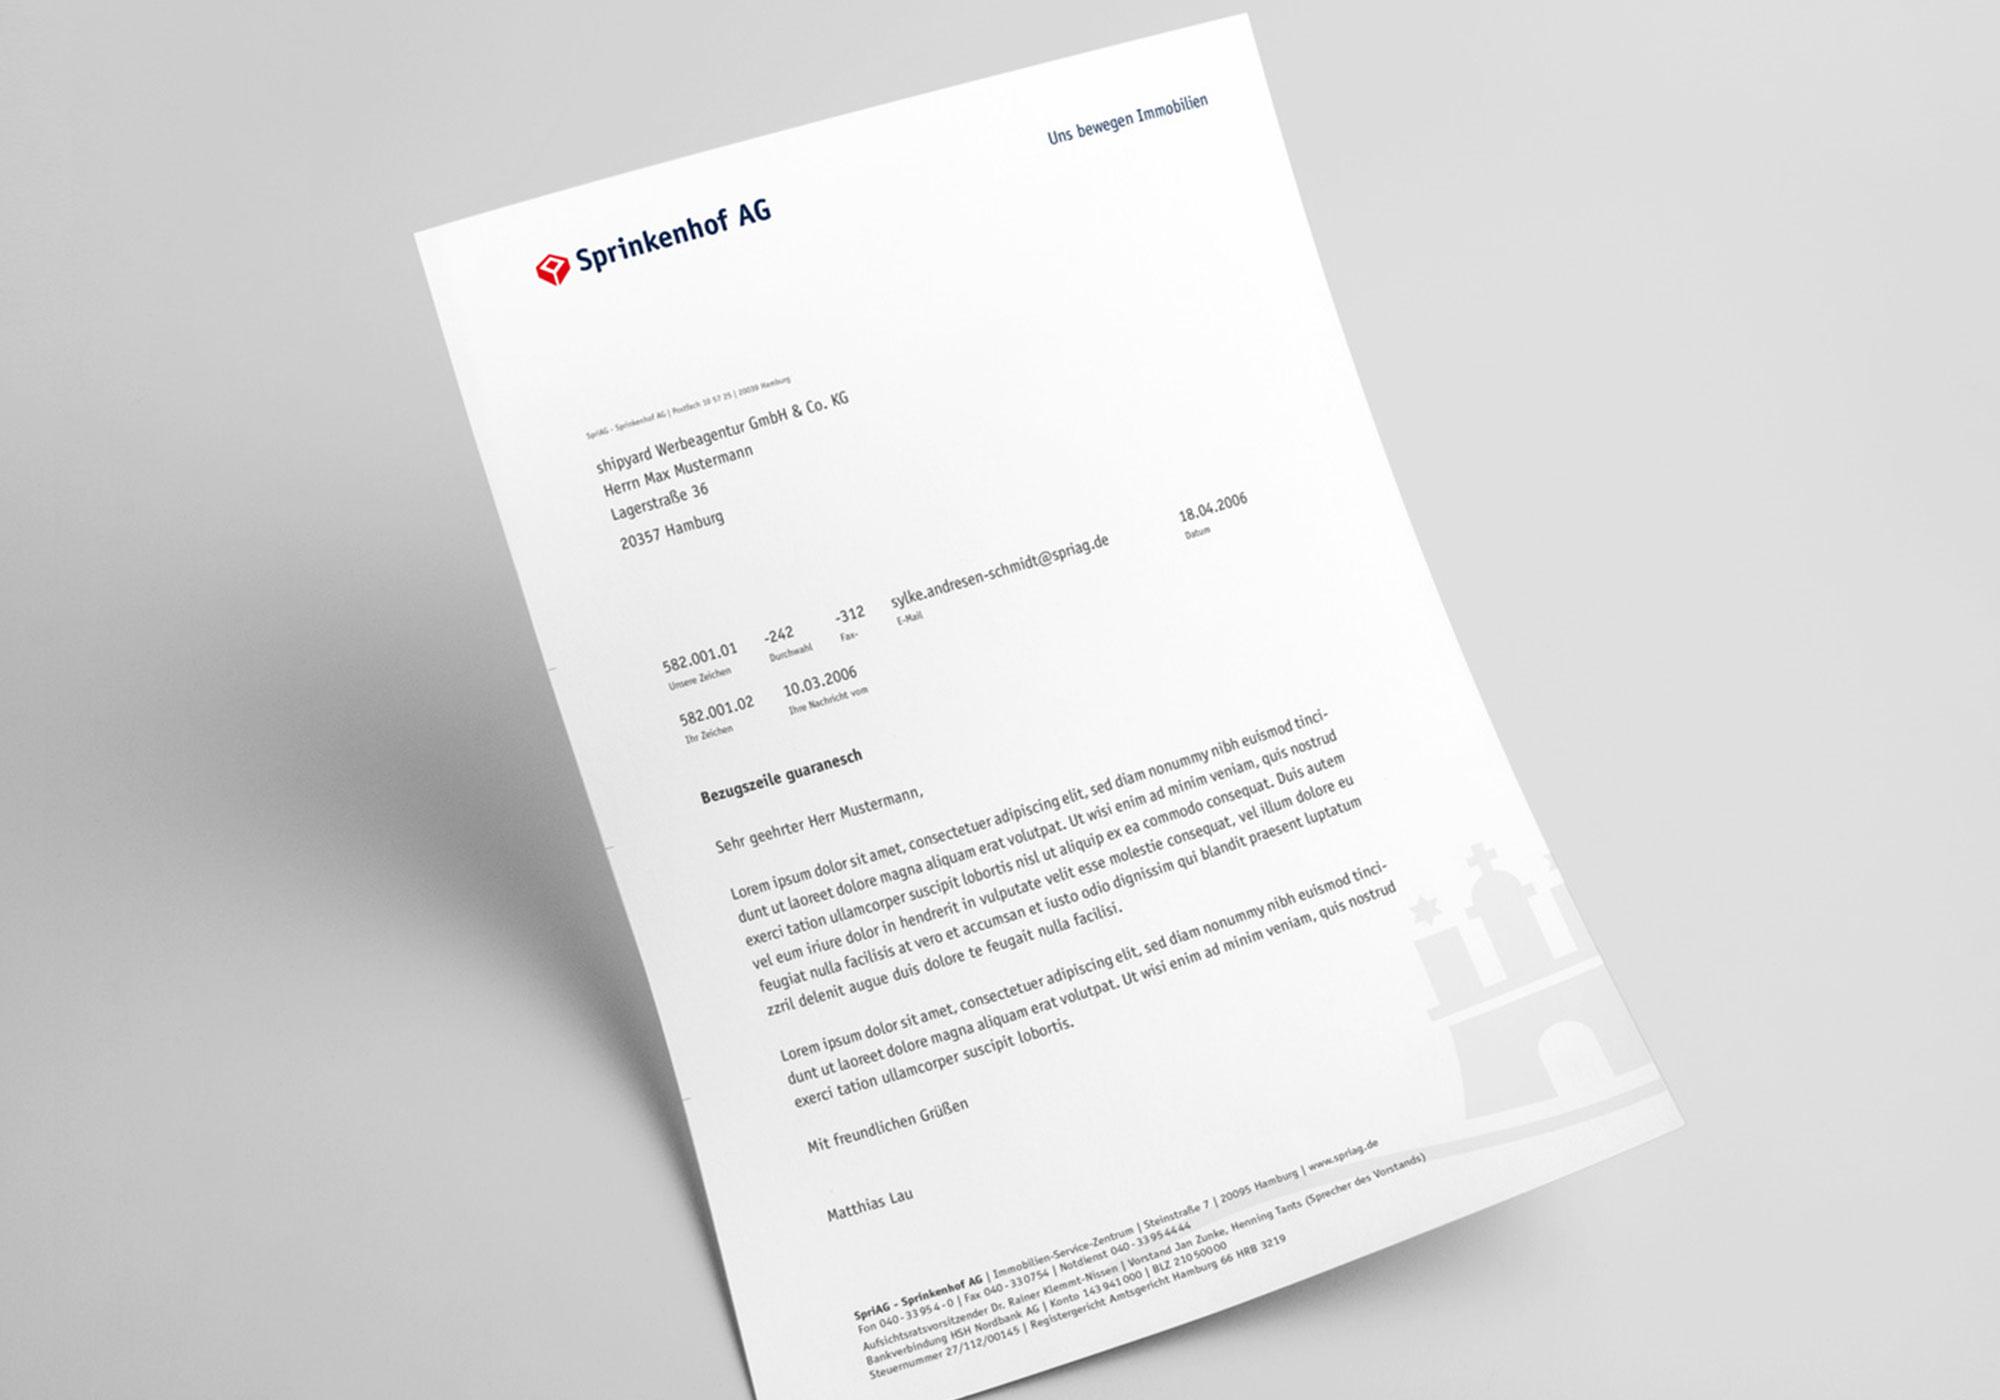 001_Sprinkenhof_Briefpaper